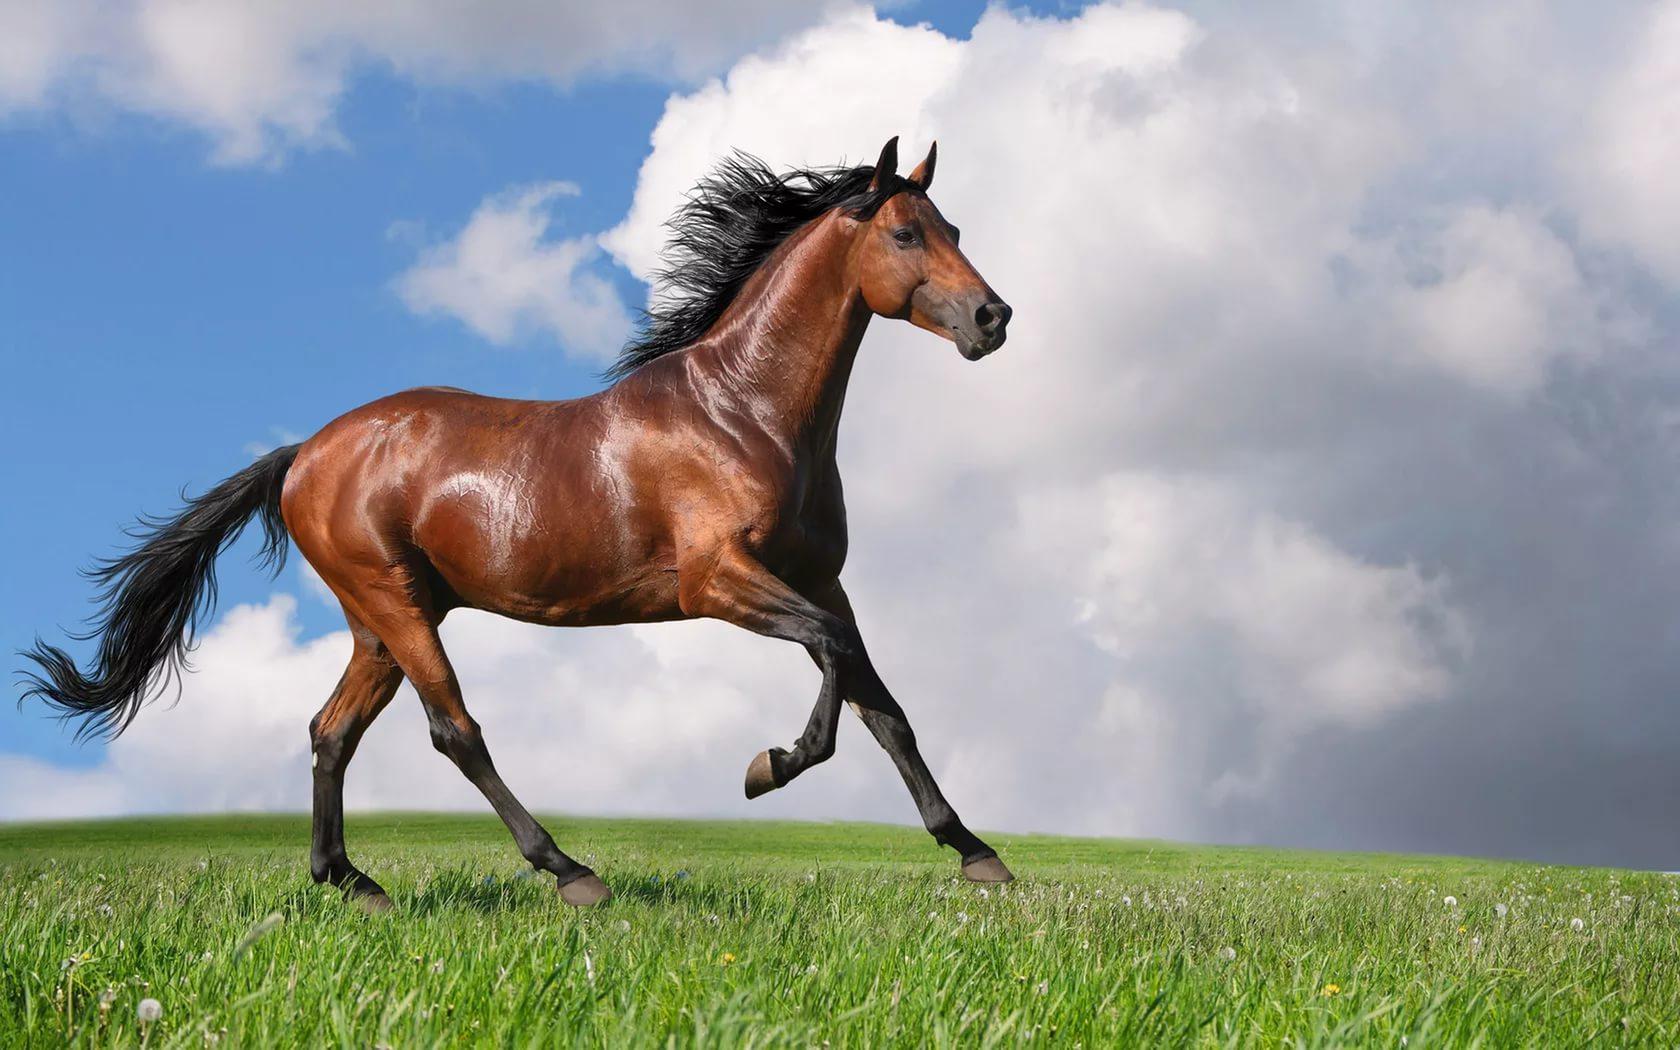 Ver fotos de caballos de mar 74